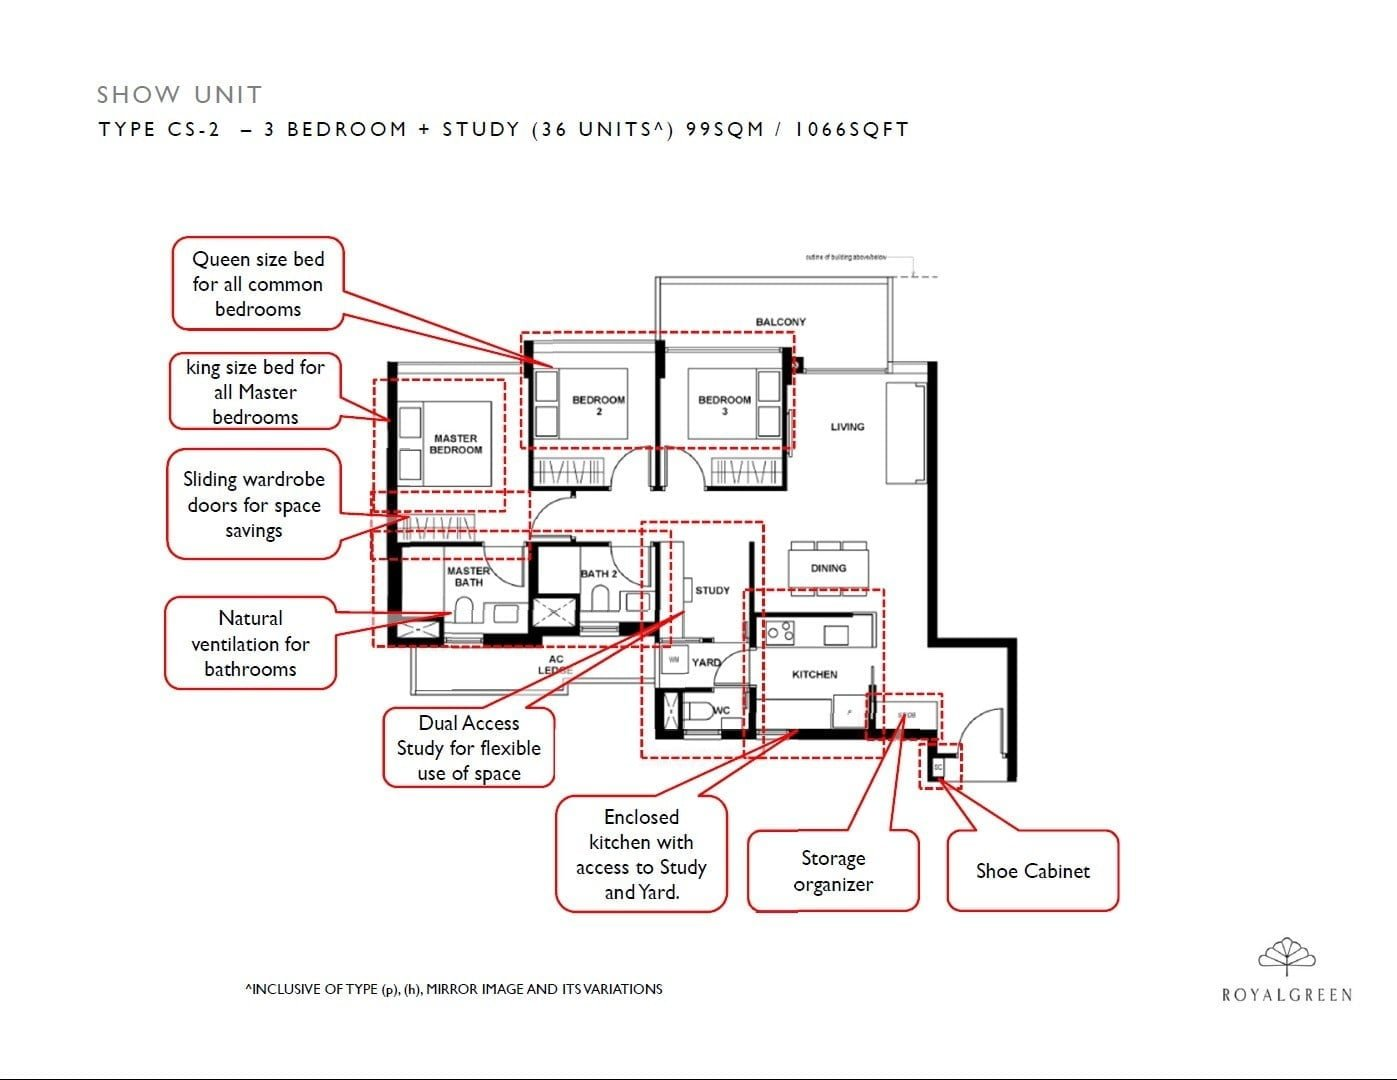 3-Bedroom-Study-show-unit-Type-CS-2-1066-sqft